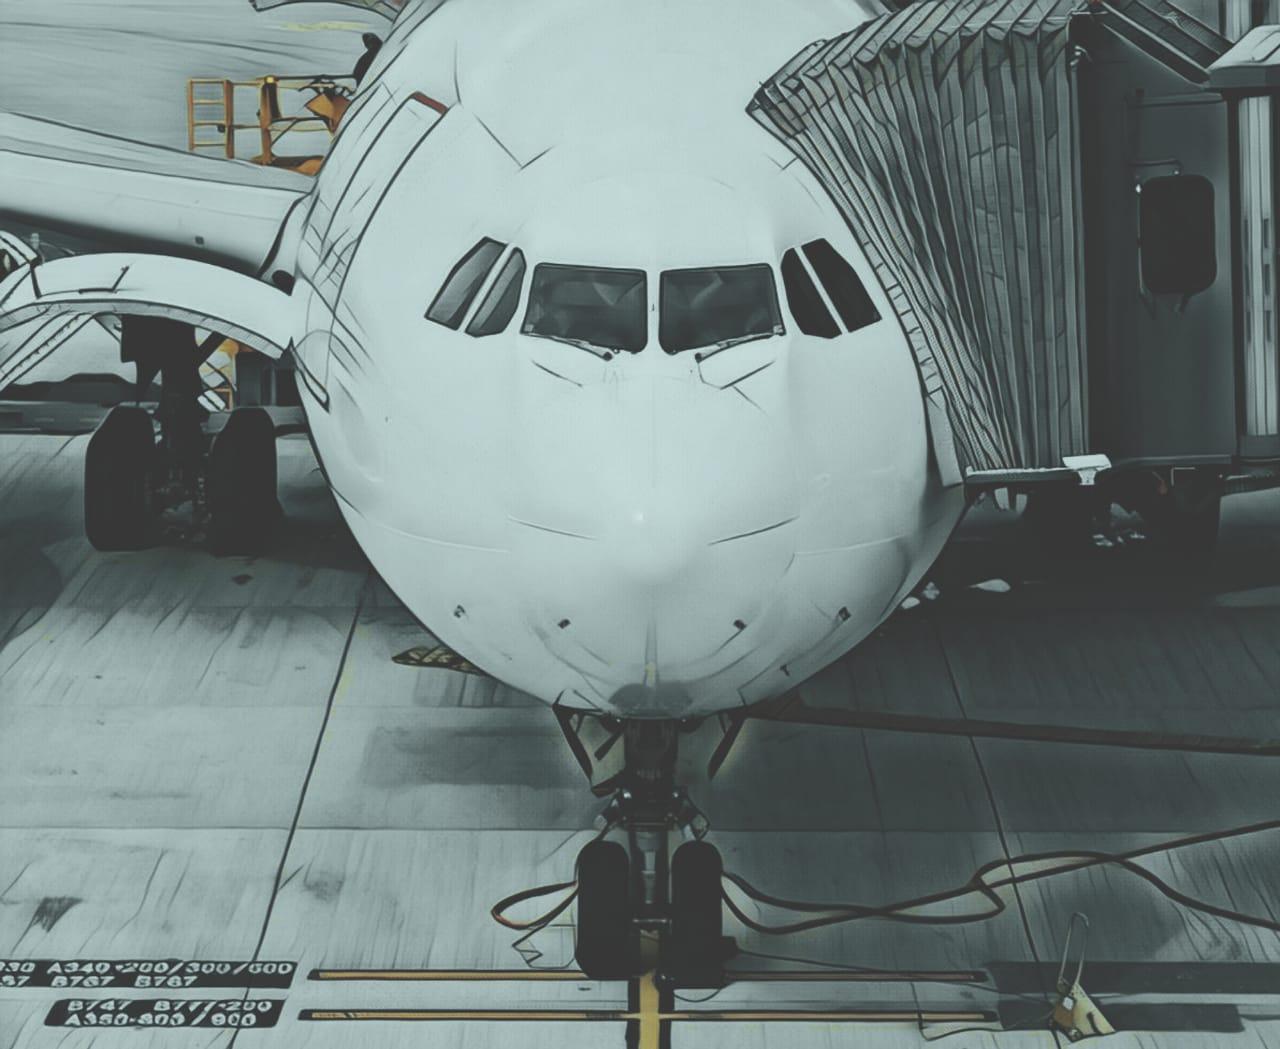 https: img.okezone.com content 2020 04 15 320 2199810 kata-menko-luhut-soal-rencana-kenaikan-tiket-pesawat-50-g0lW7l8kx2.jpeg